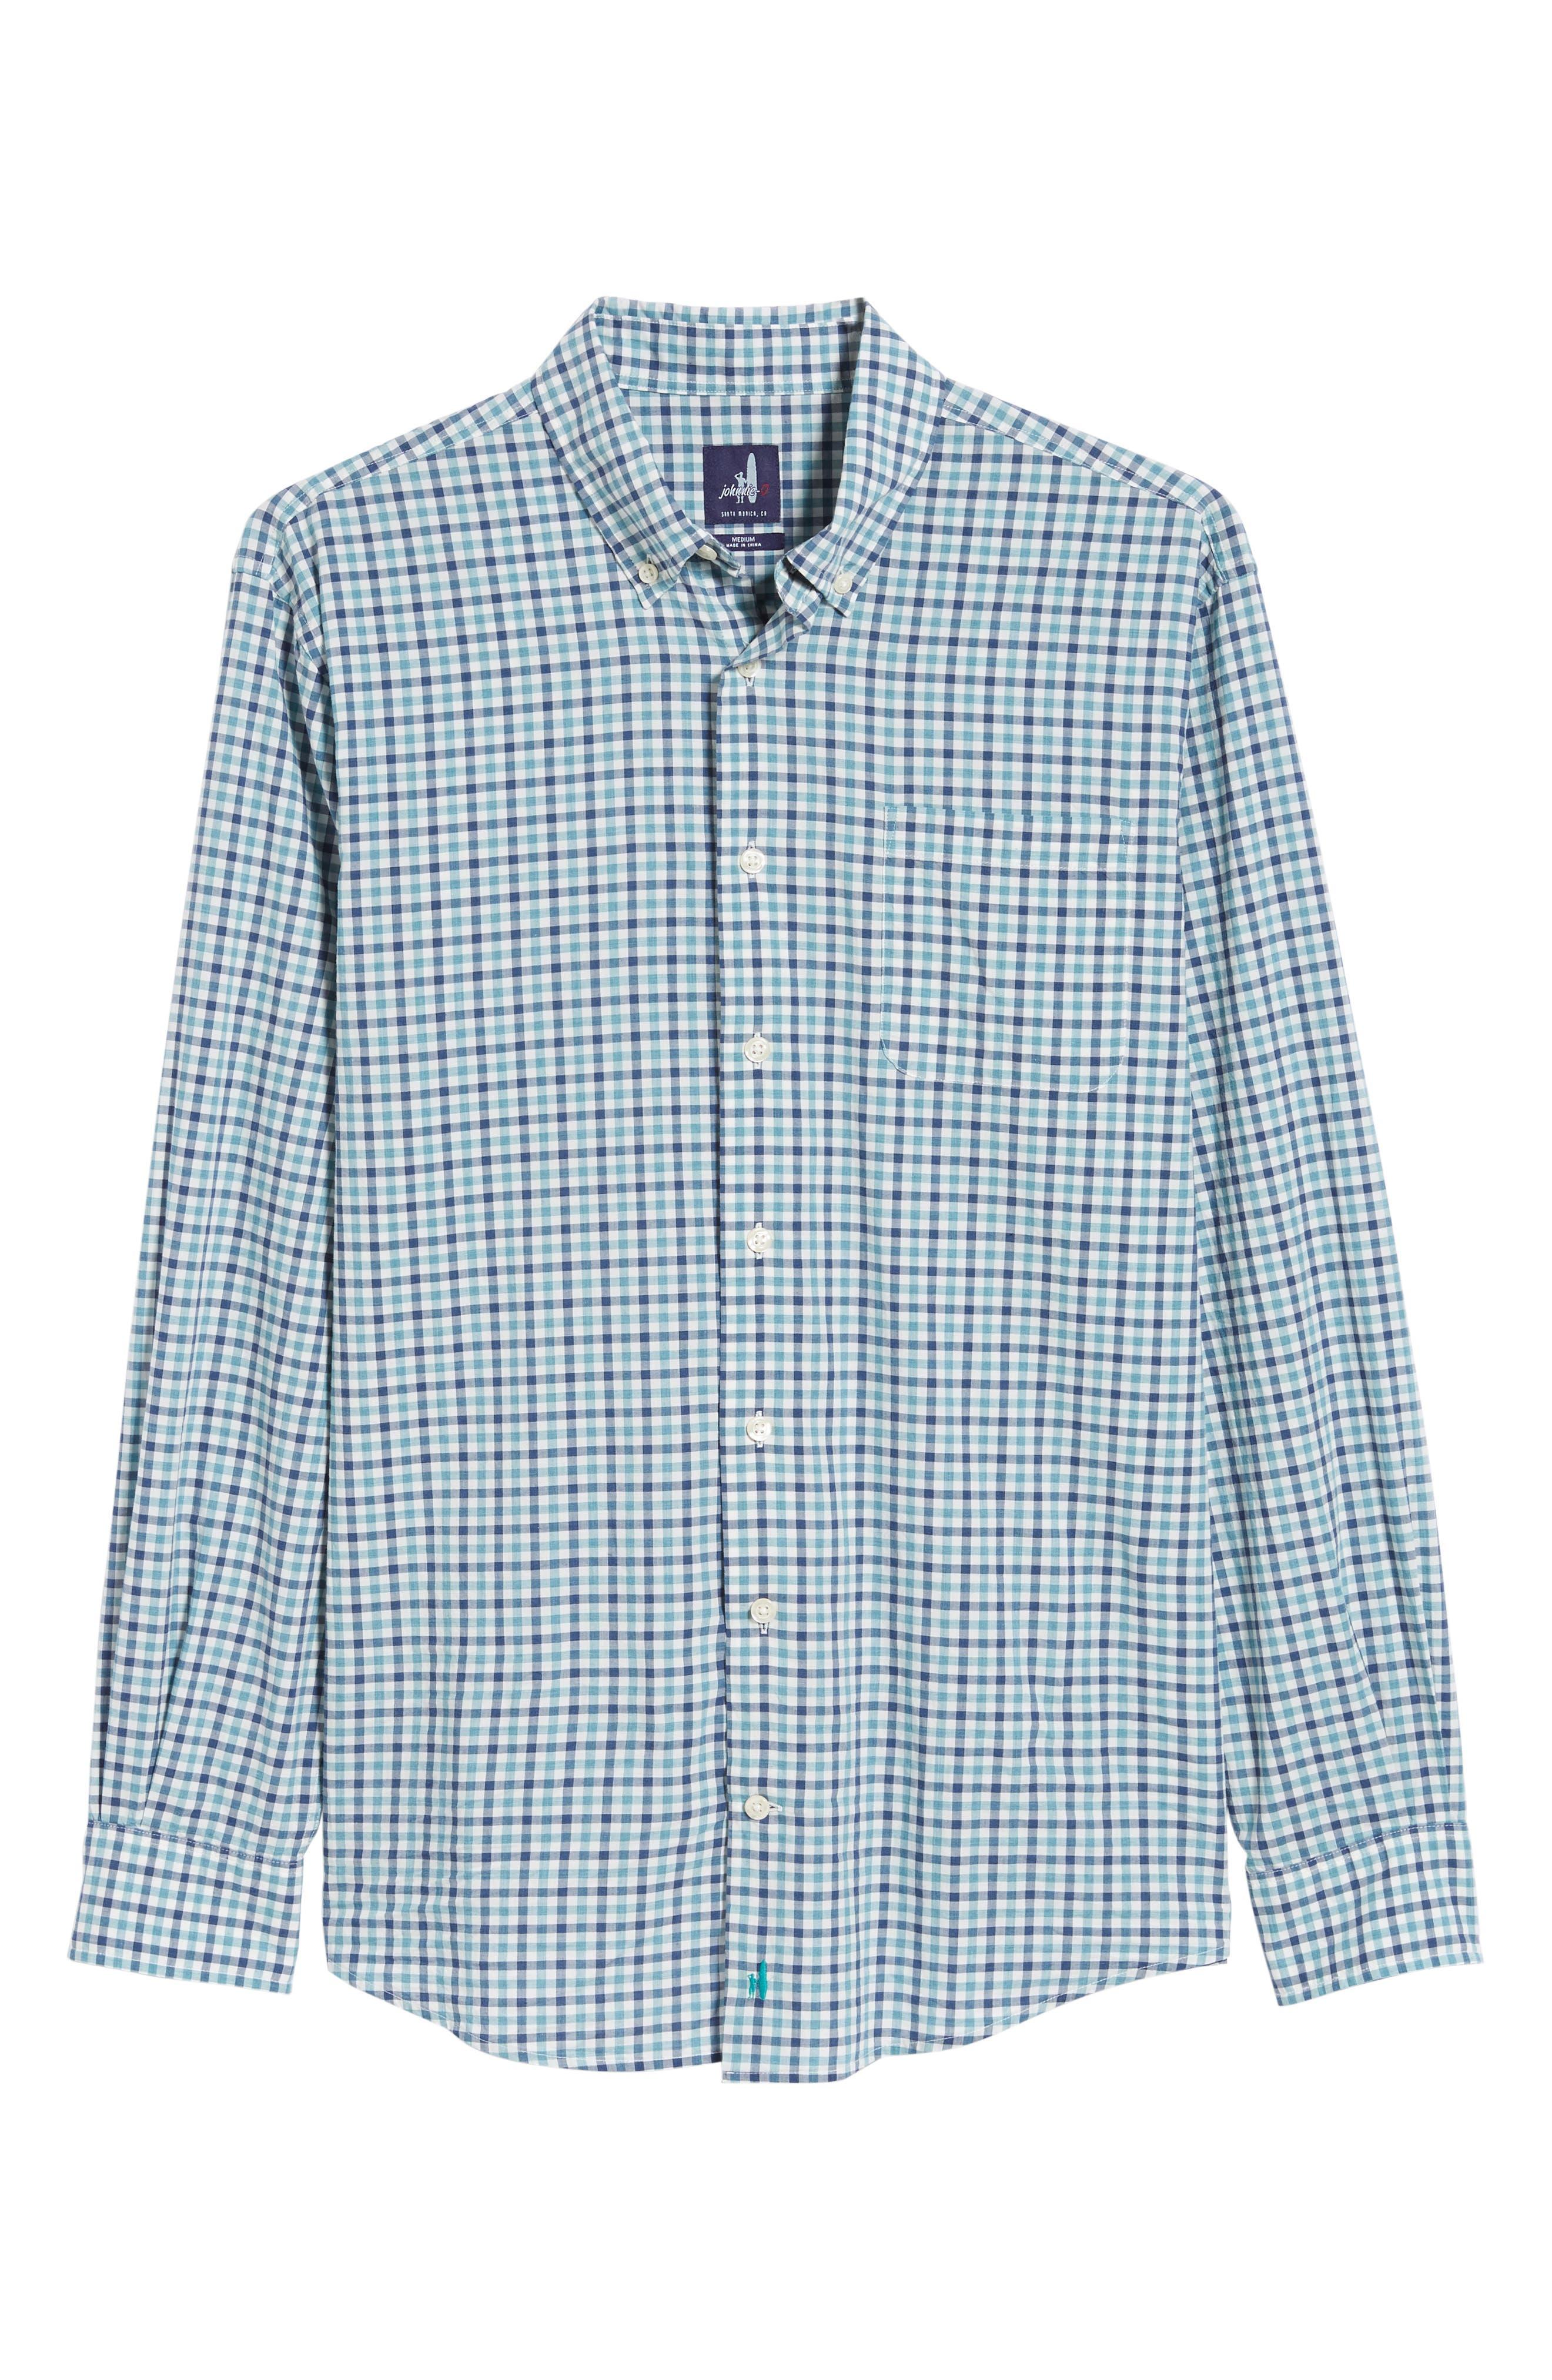 Finley Classic Fit Sport Shirt,                             Alternate thumbnail 5, color,                             JADE